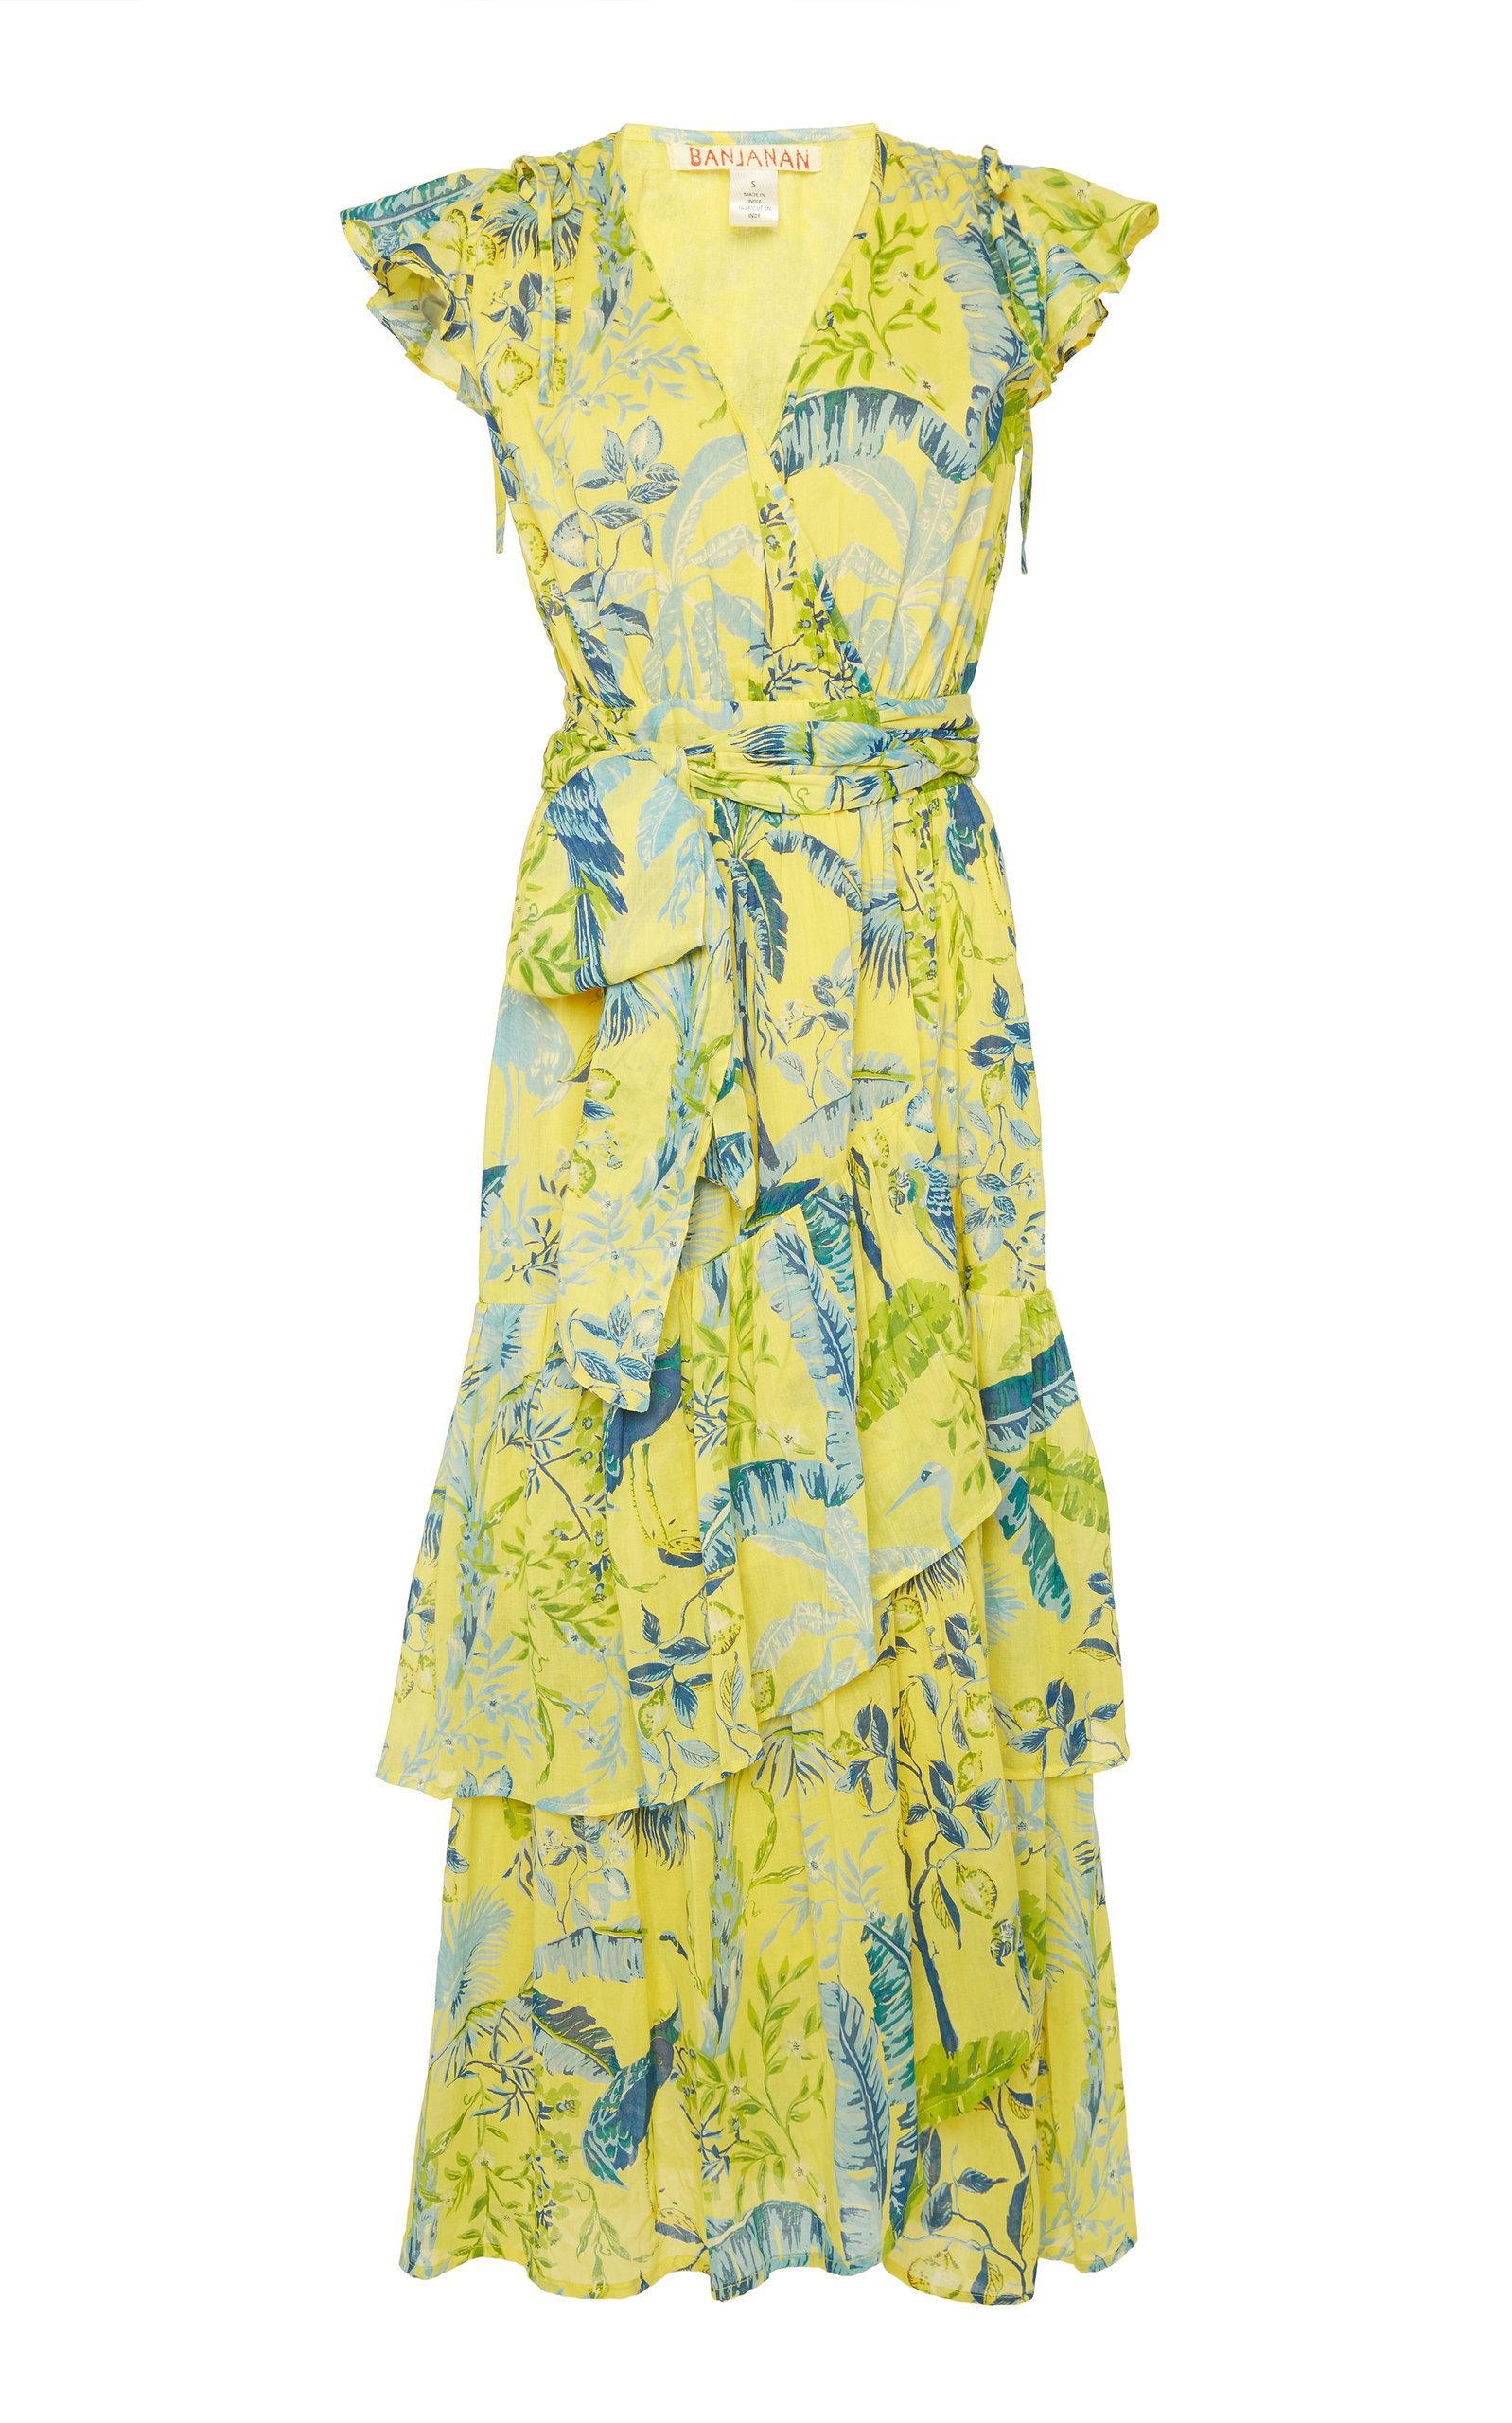 Banjanan Mercy Ruffled Printed Cotton Midi Dress In Yellow